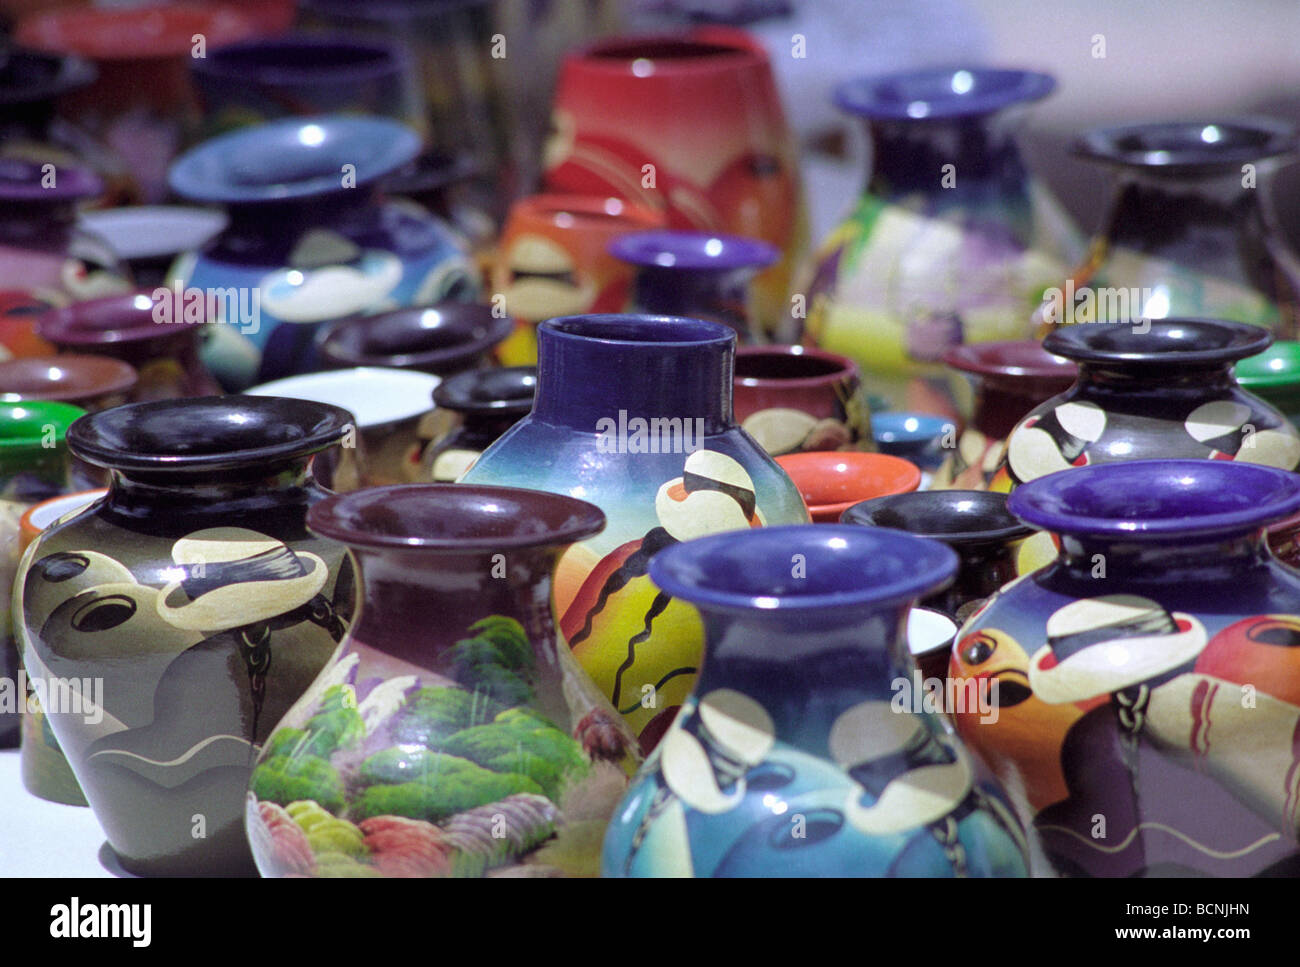 Amerindian crafts-  brightly coloured painted pottery vases, Otavlau, Ecuador - Stock Image